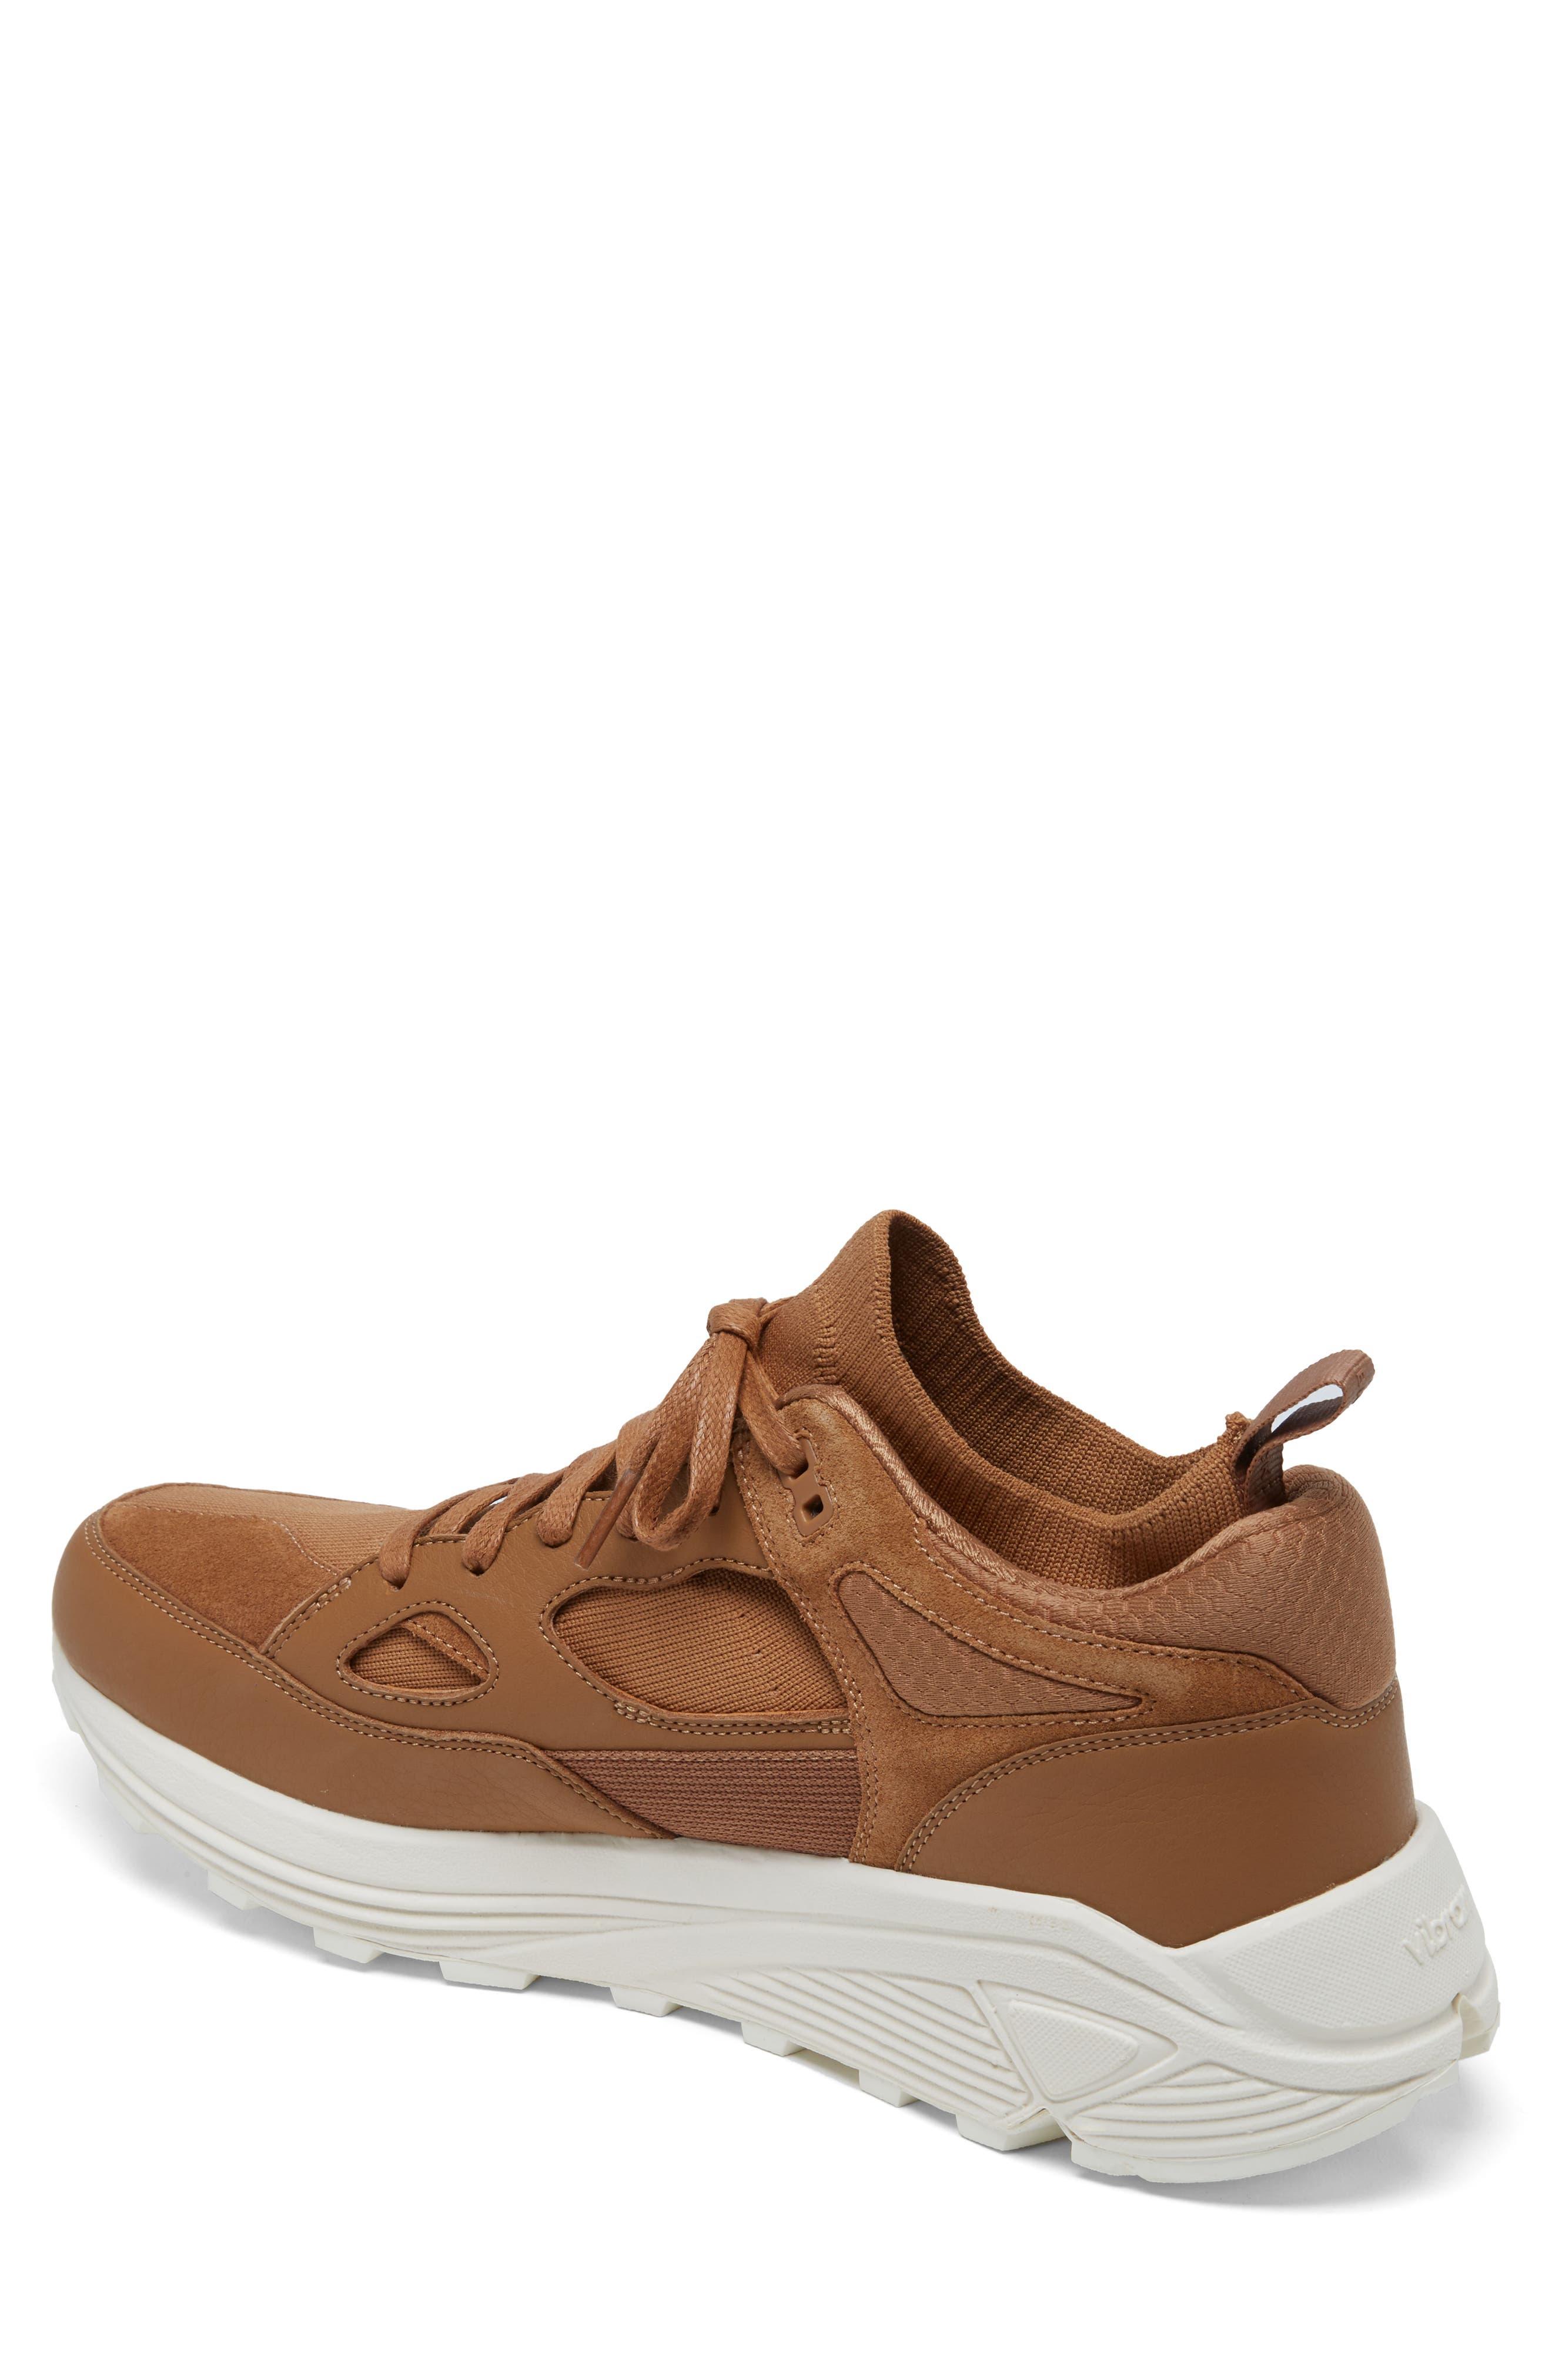 Aura Sneaker,                             Alternate thumbnail 7, color,